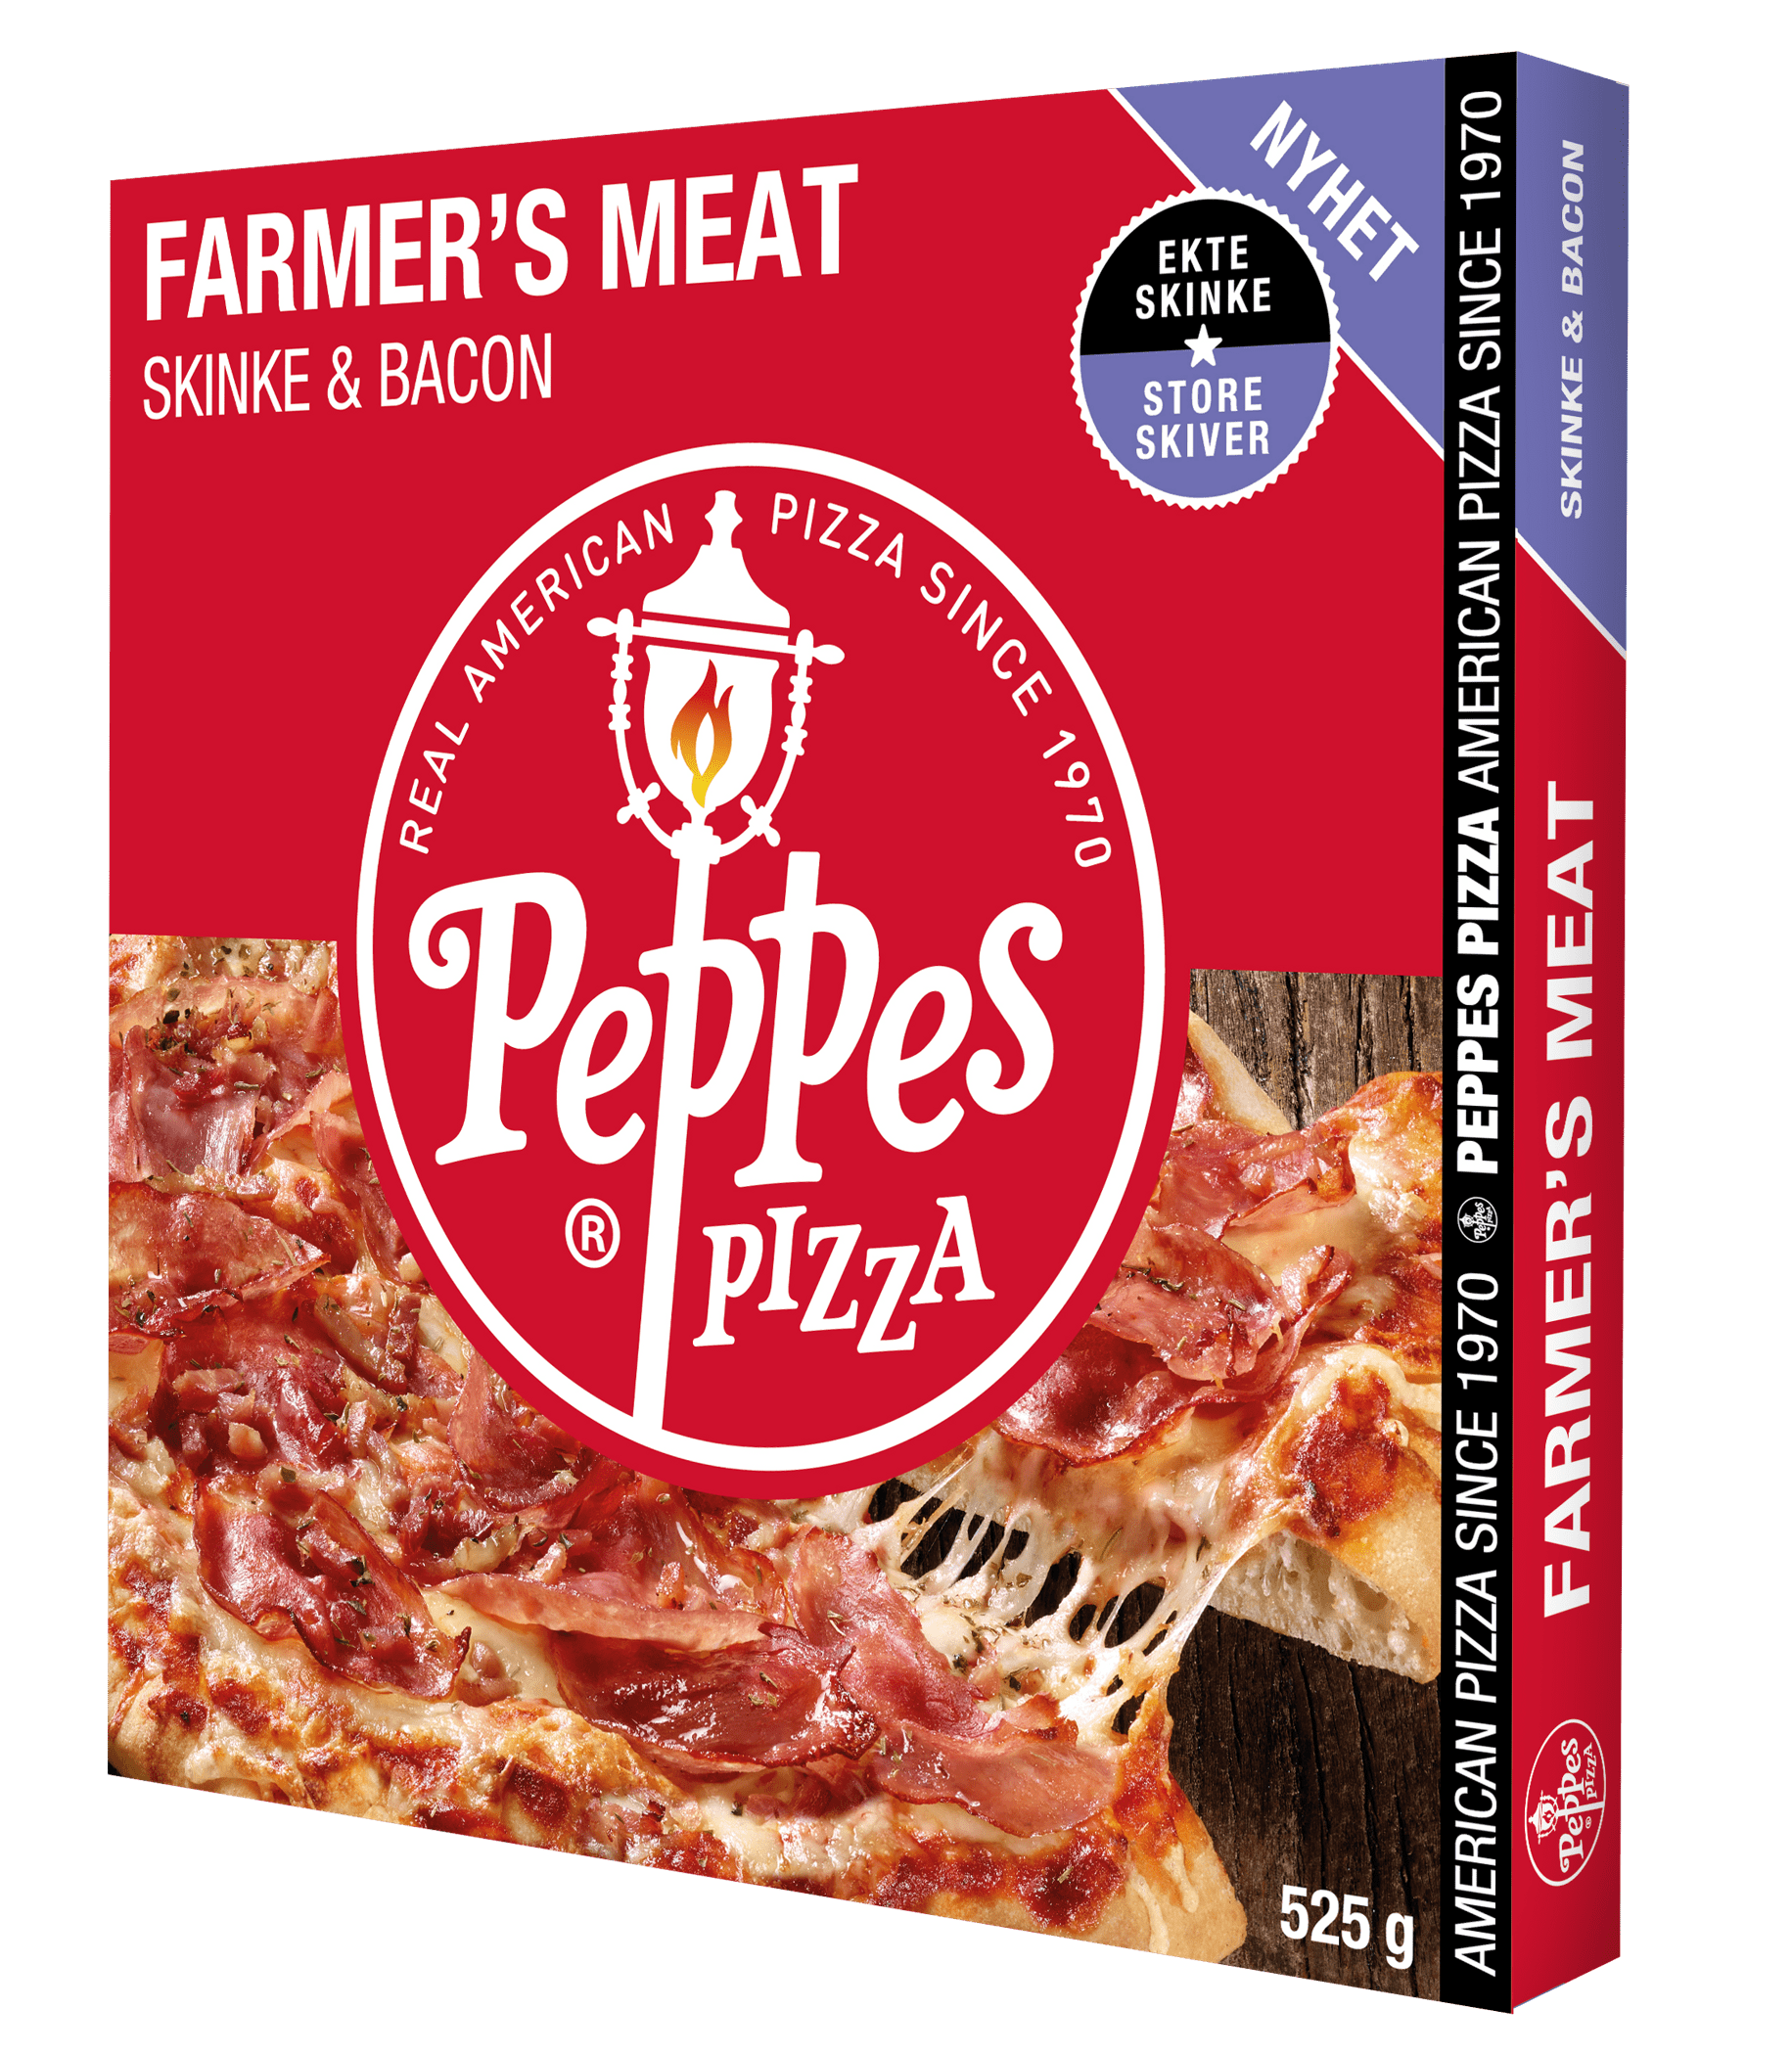 Peppes_FarmersMeat_frossen_pizza_180619_mockup.png